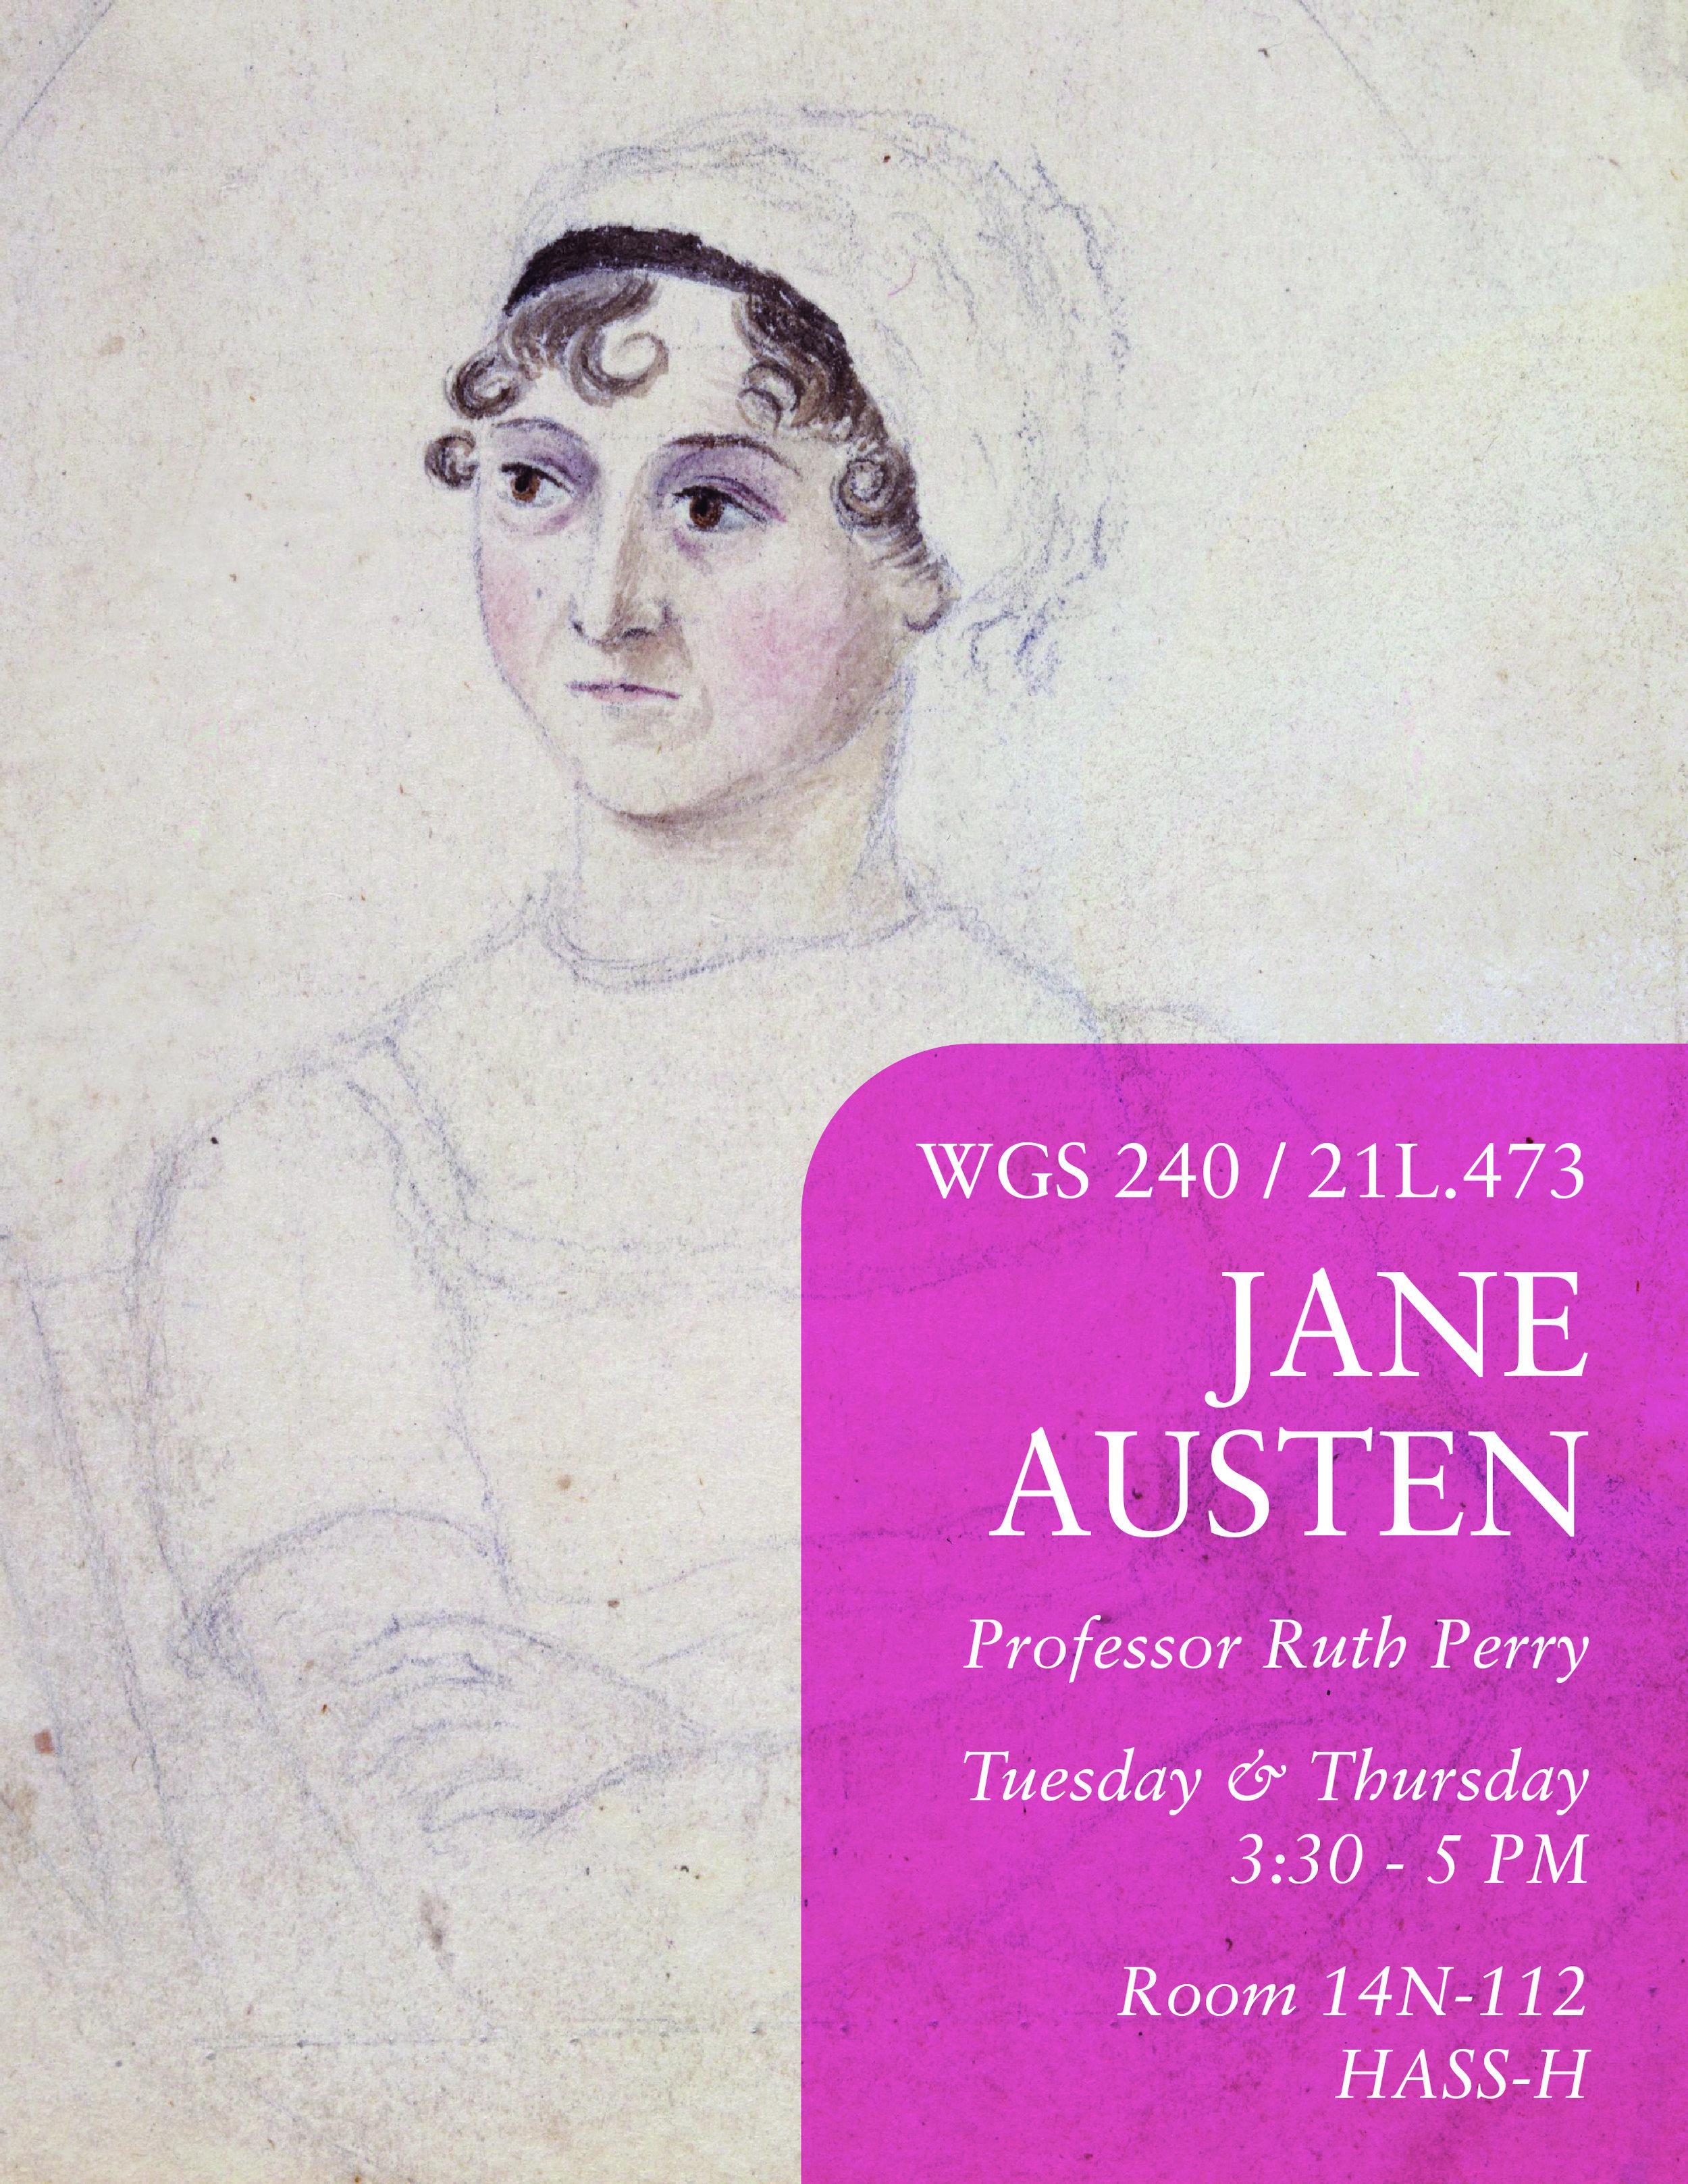 WGS240-JaneAusten-01.jpg